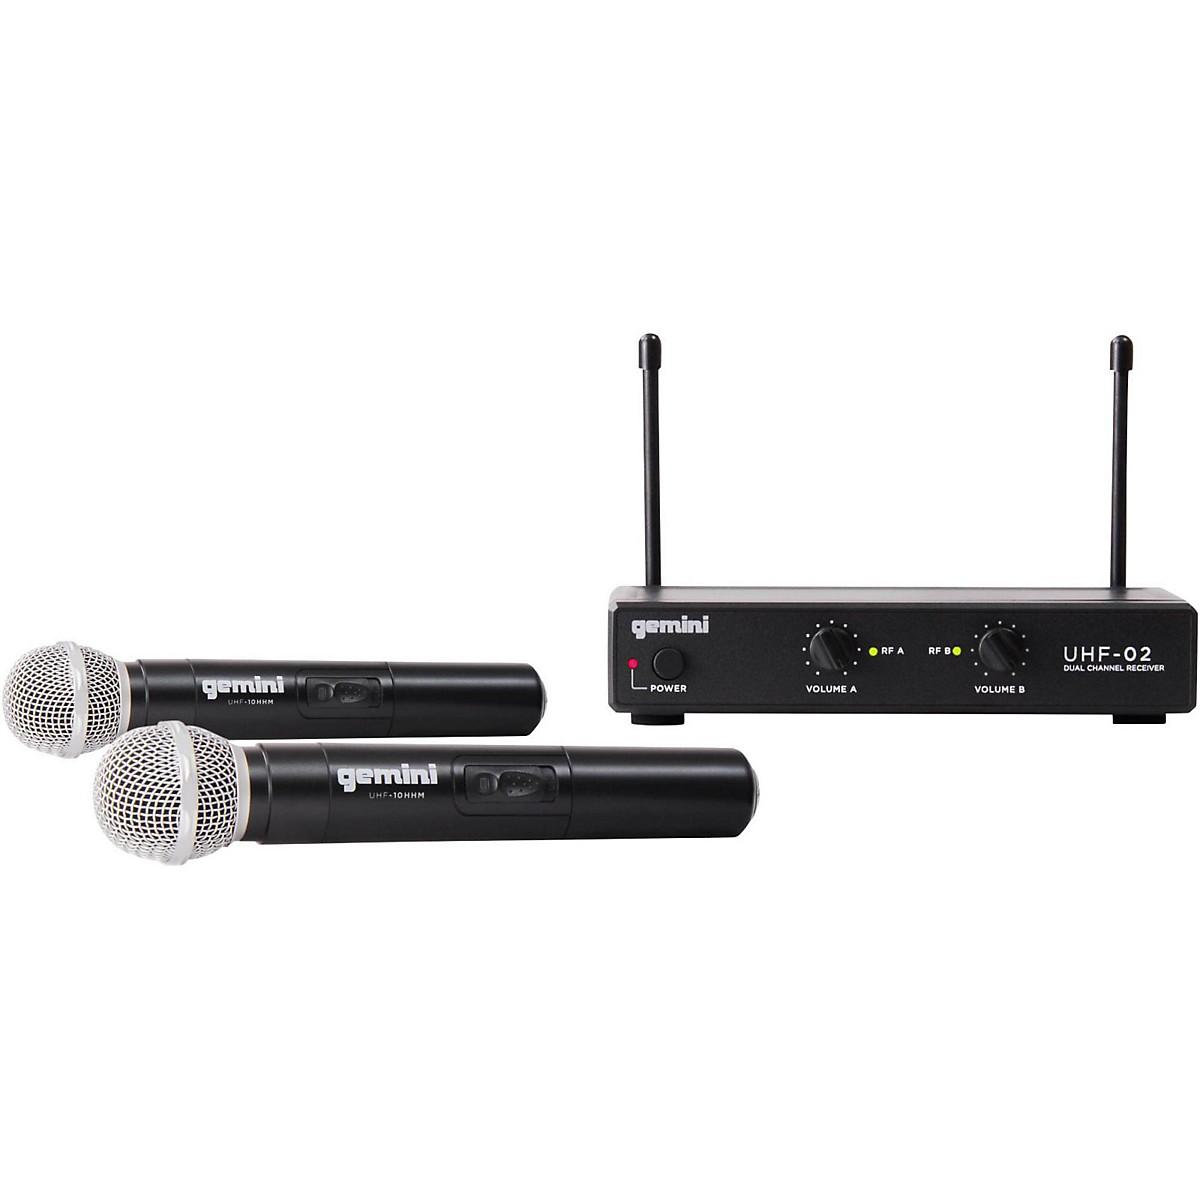 Gemini UHF-02M 2-Channel Wireless Handheld Microphone System